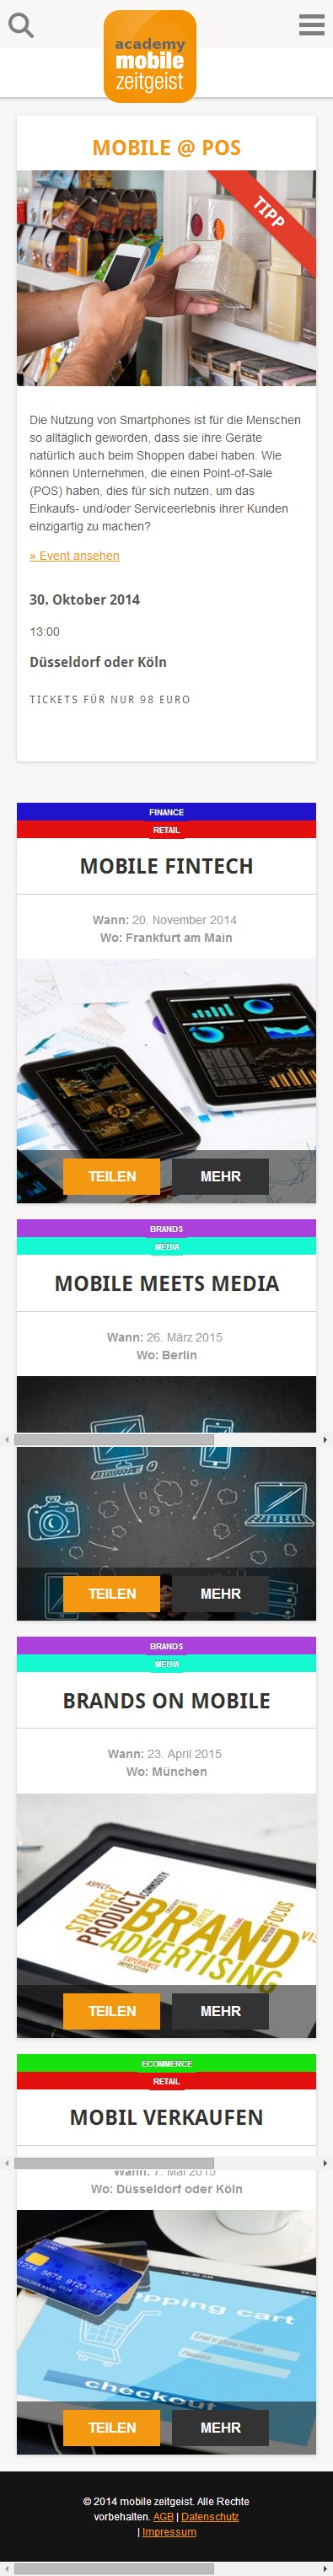 mzacademy.de - Startseite mobile